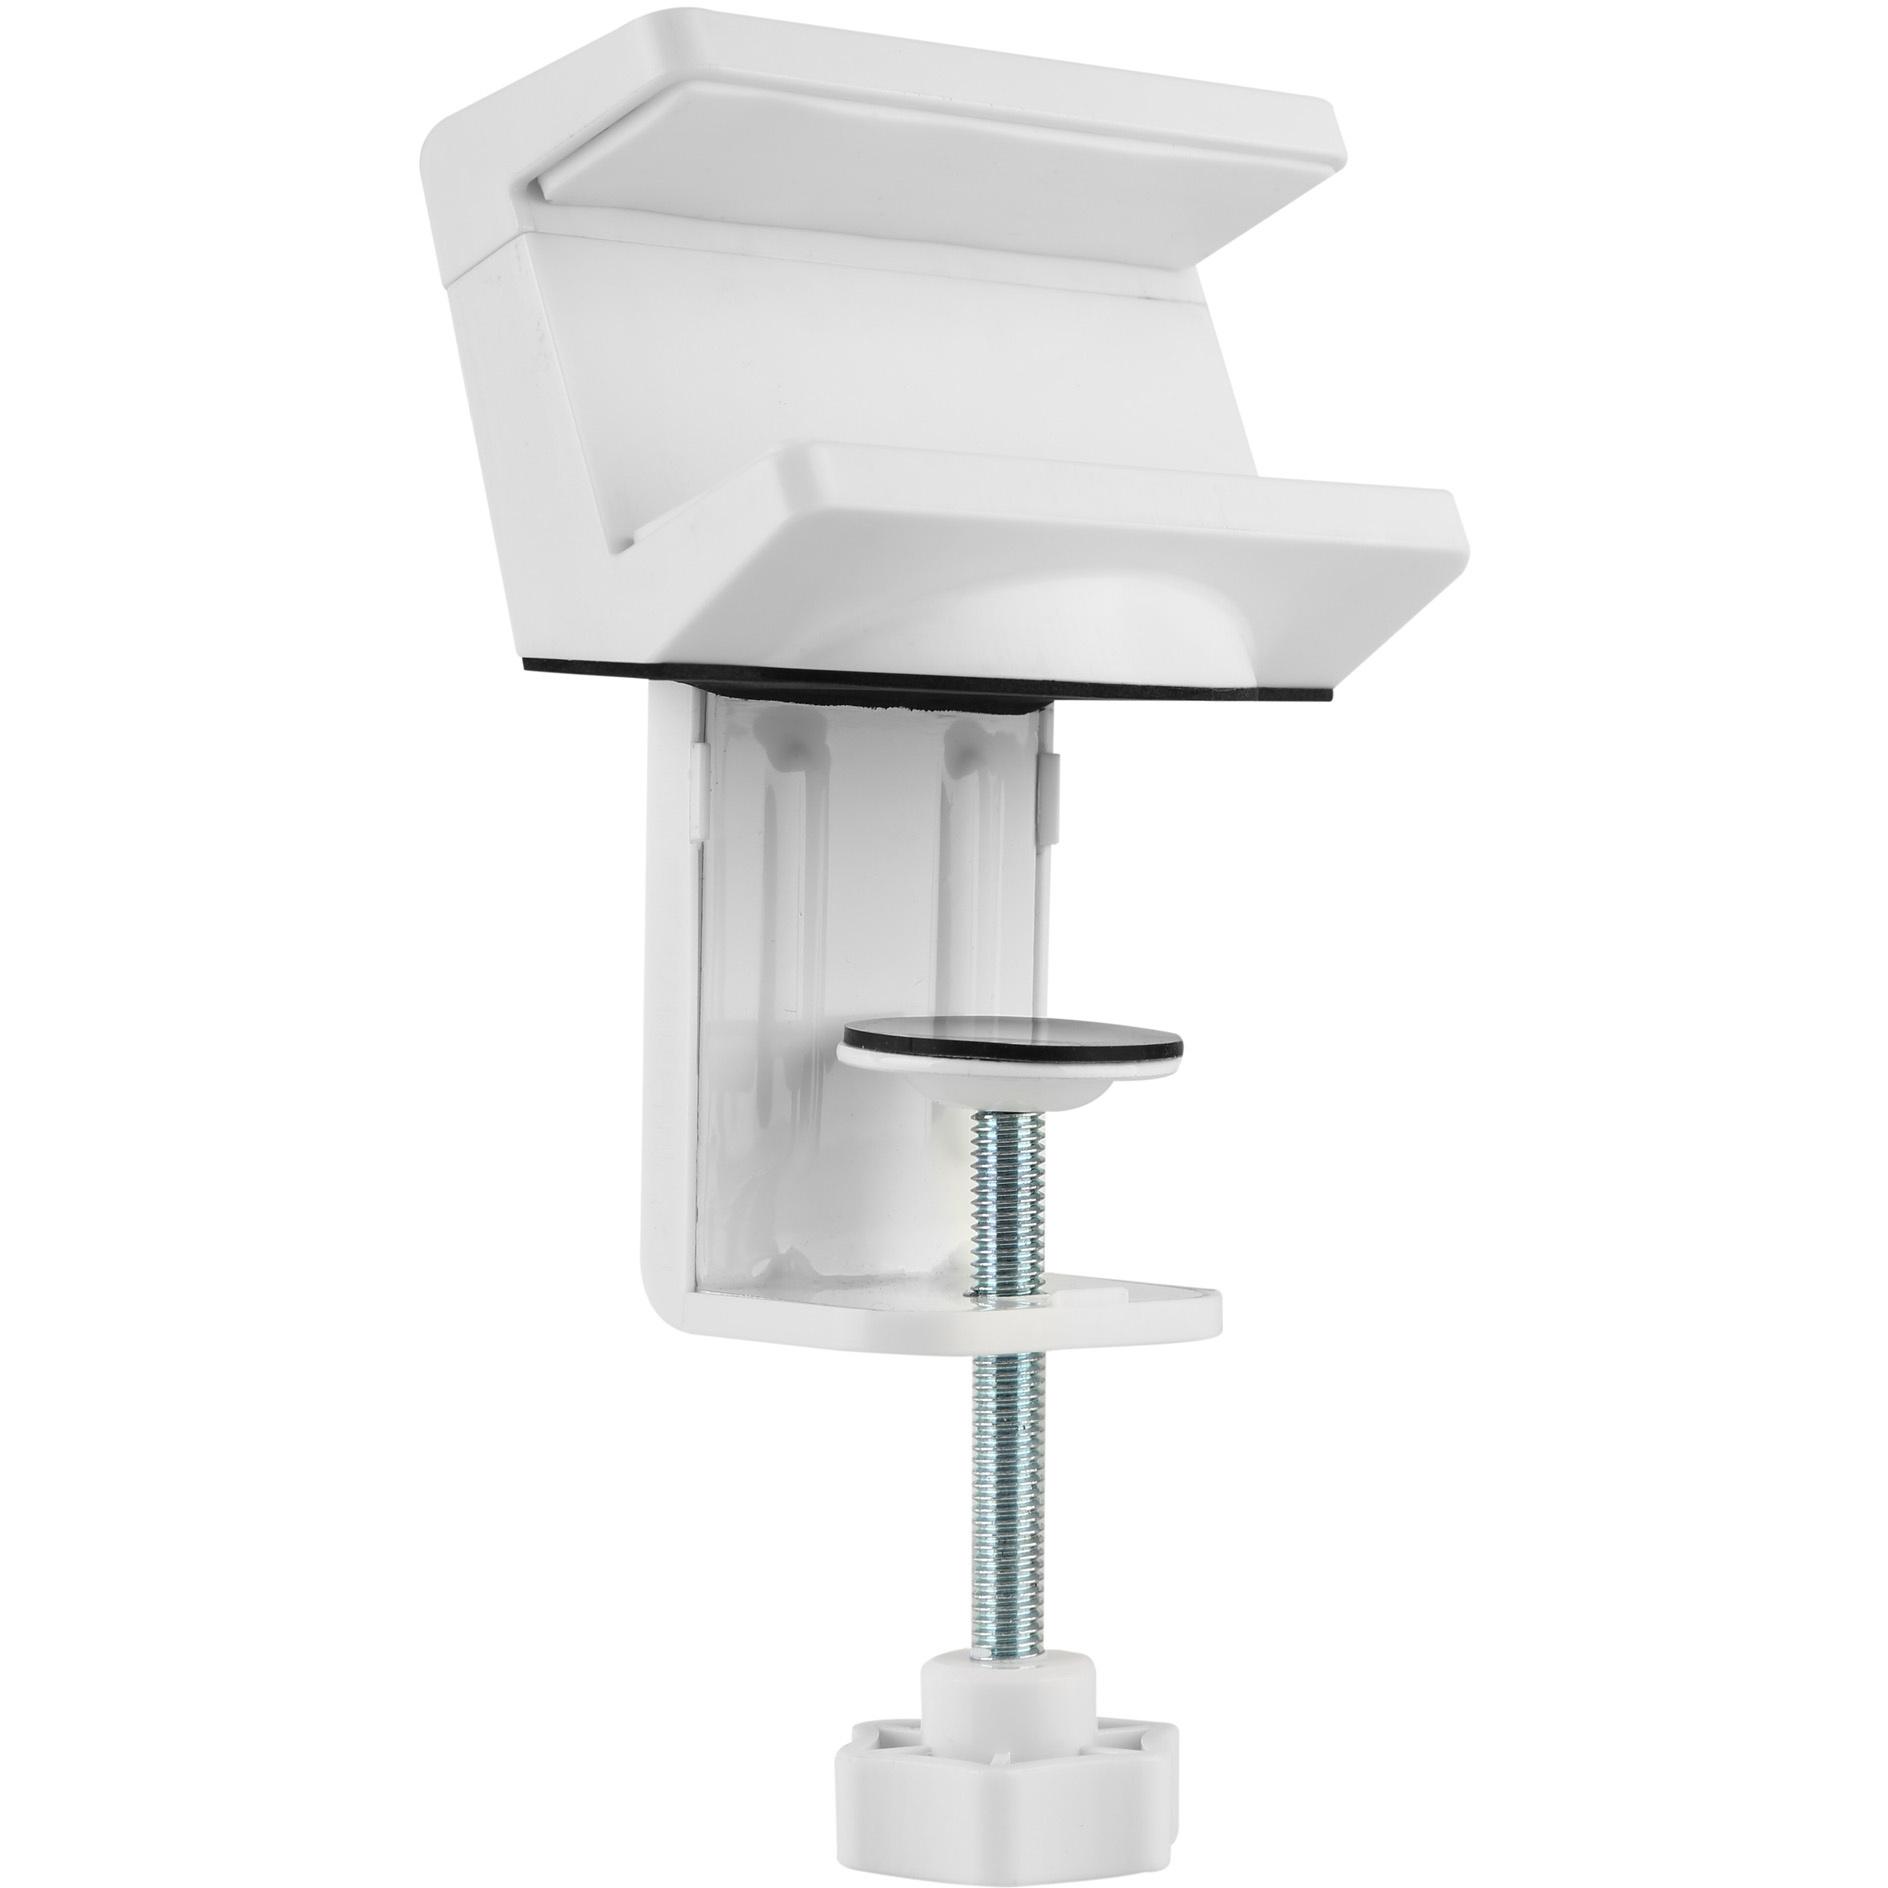 Ergopro Clamp-On power strip holder